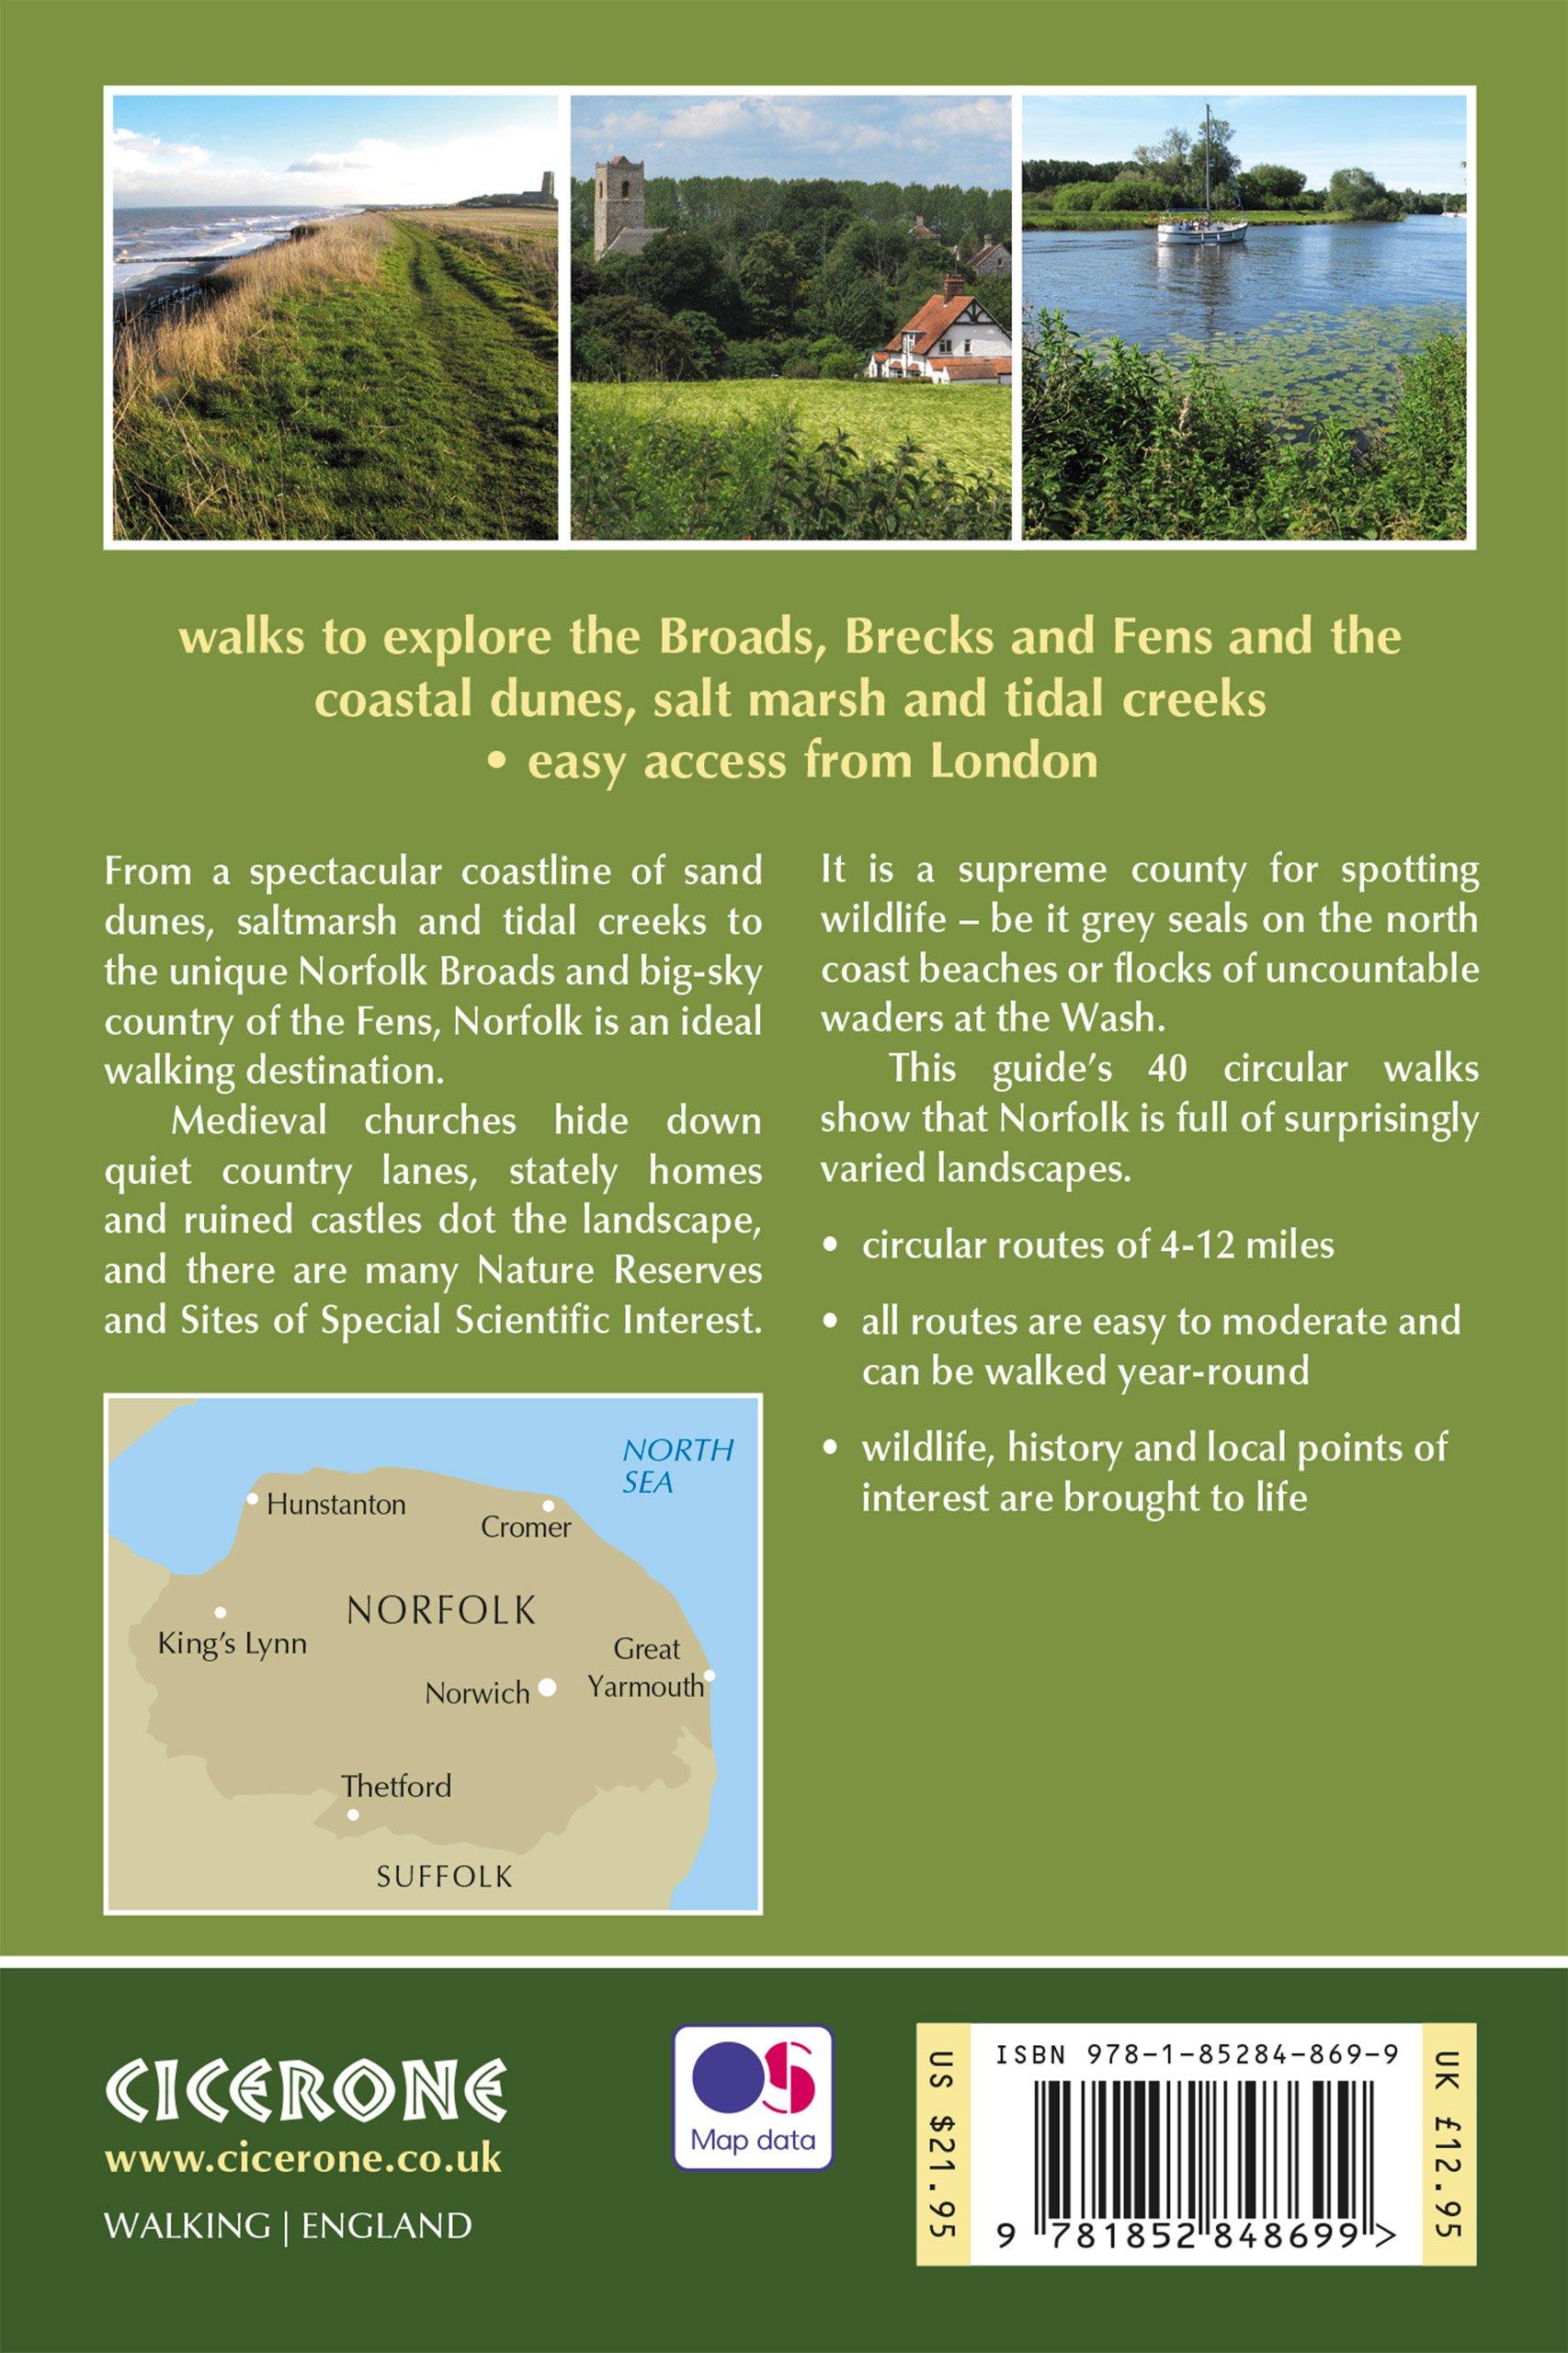 Walking in Norfolk: 40 Circular Walks in the Broads, Brecks